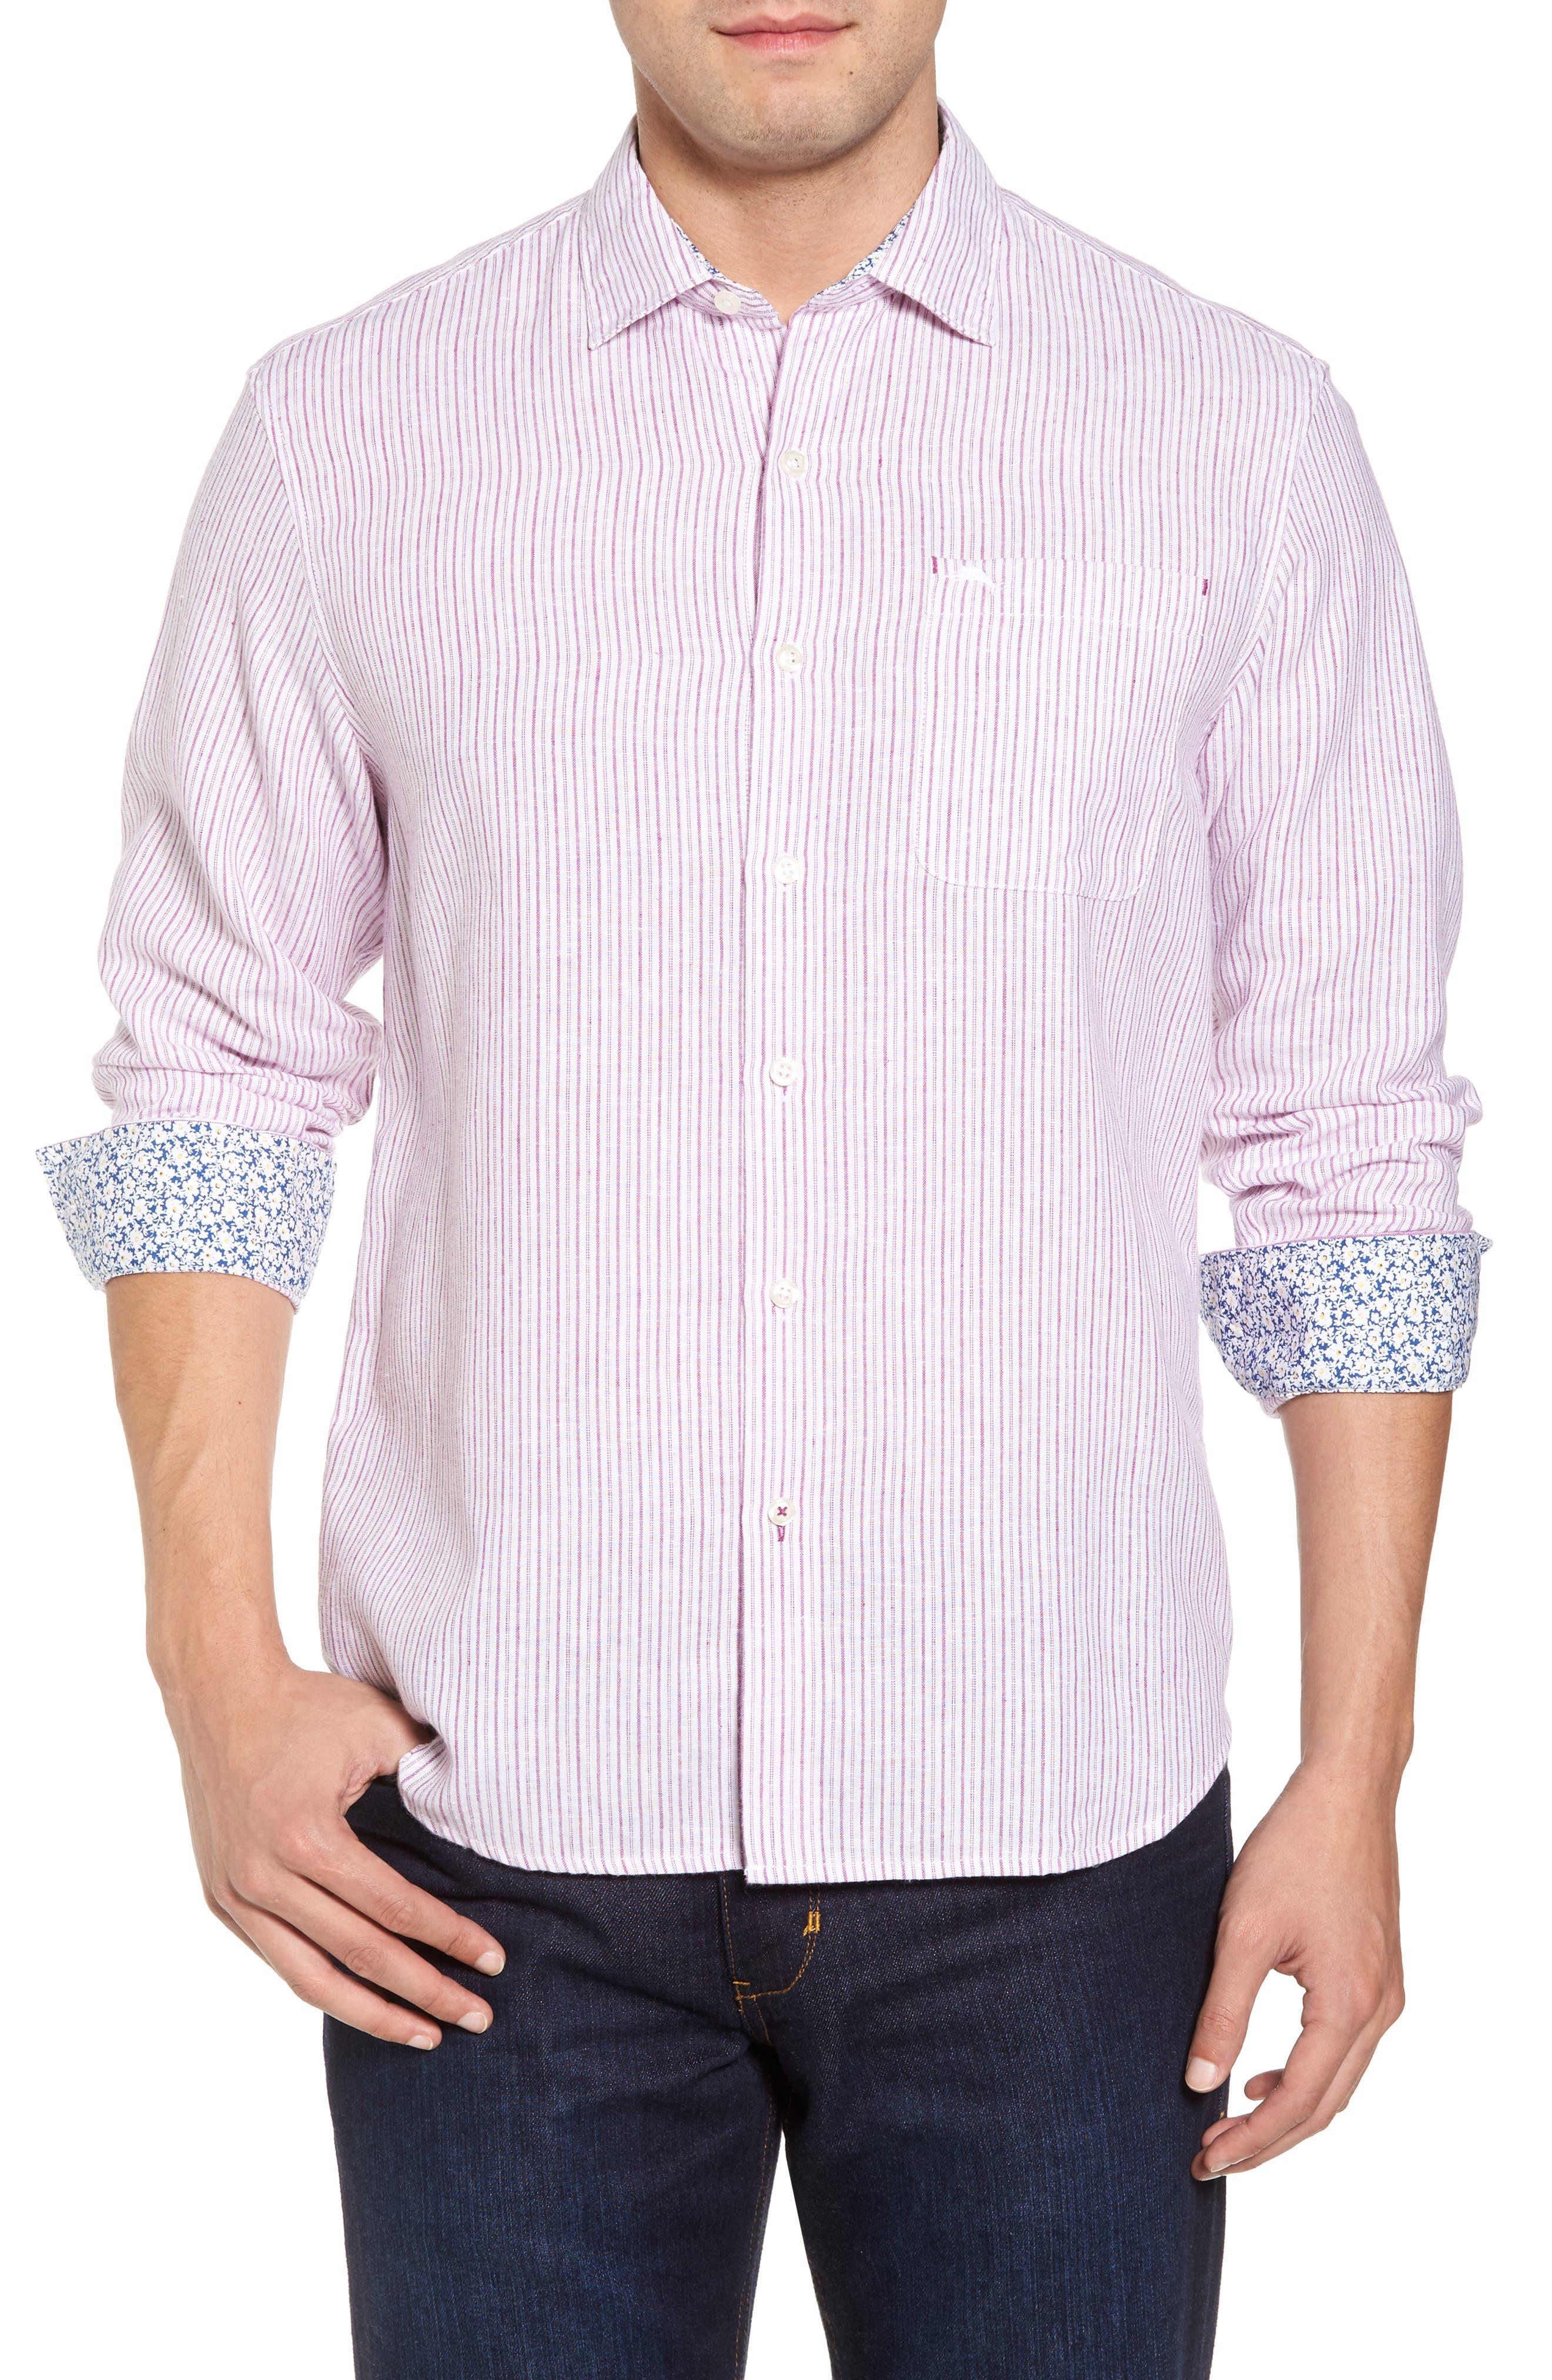 Alternate Image 1 Selected - Tommy Bahama Bungalow Stripe Regular Fit Linen Blend Sport Shirt